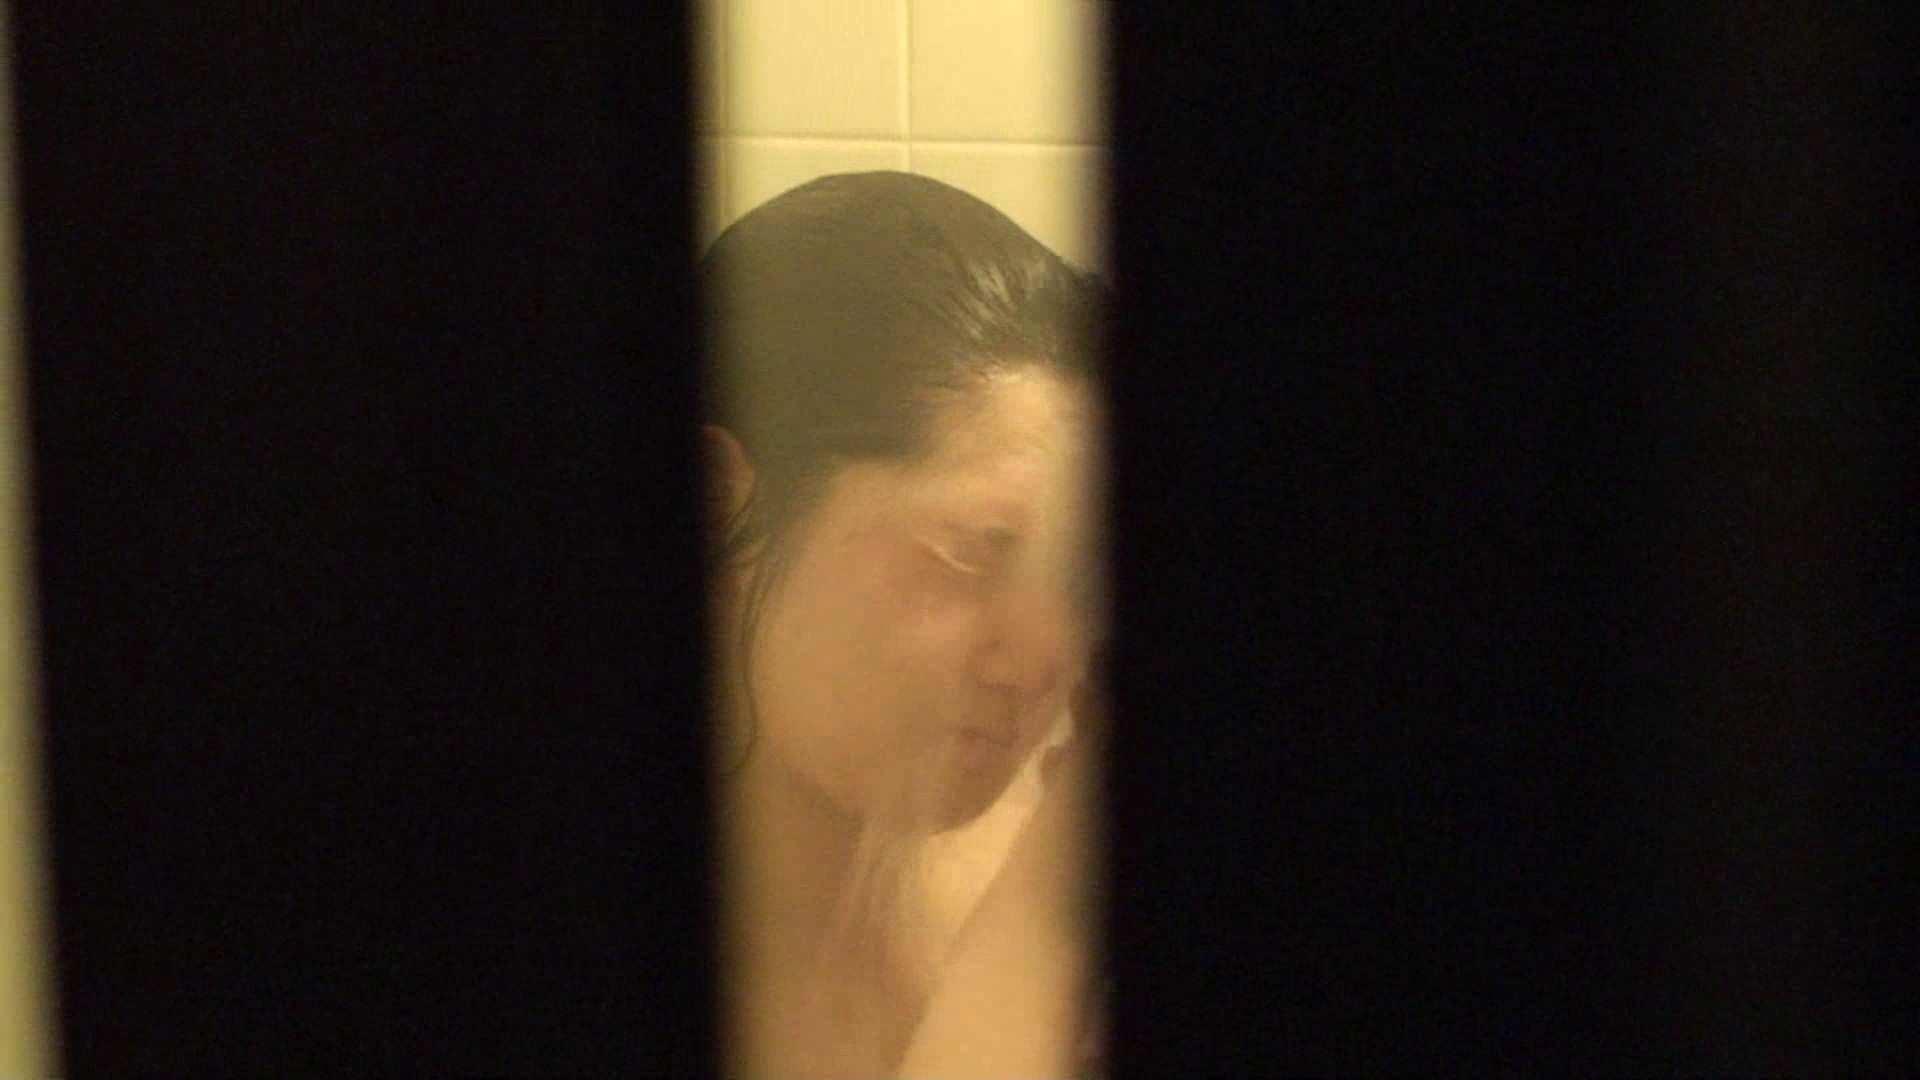 vol.02超可愛すぎる彼女の裸体をハイビジョンで!至近距離での眺め最高! 覗き 隠し撮りオマンコ動画紹介 103pic 39